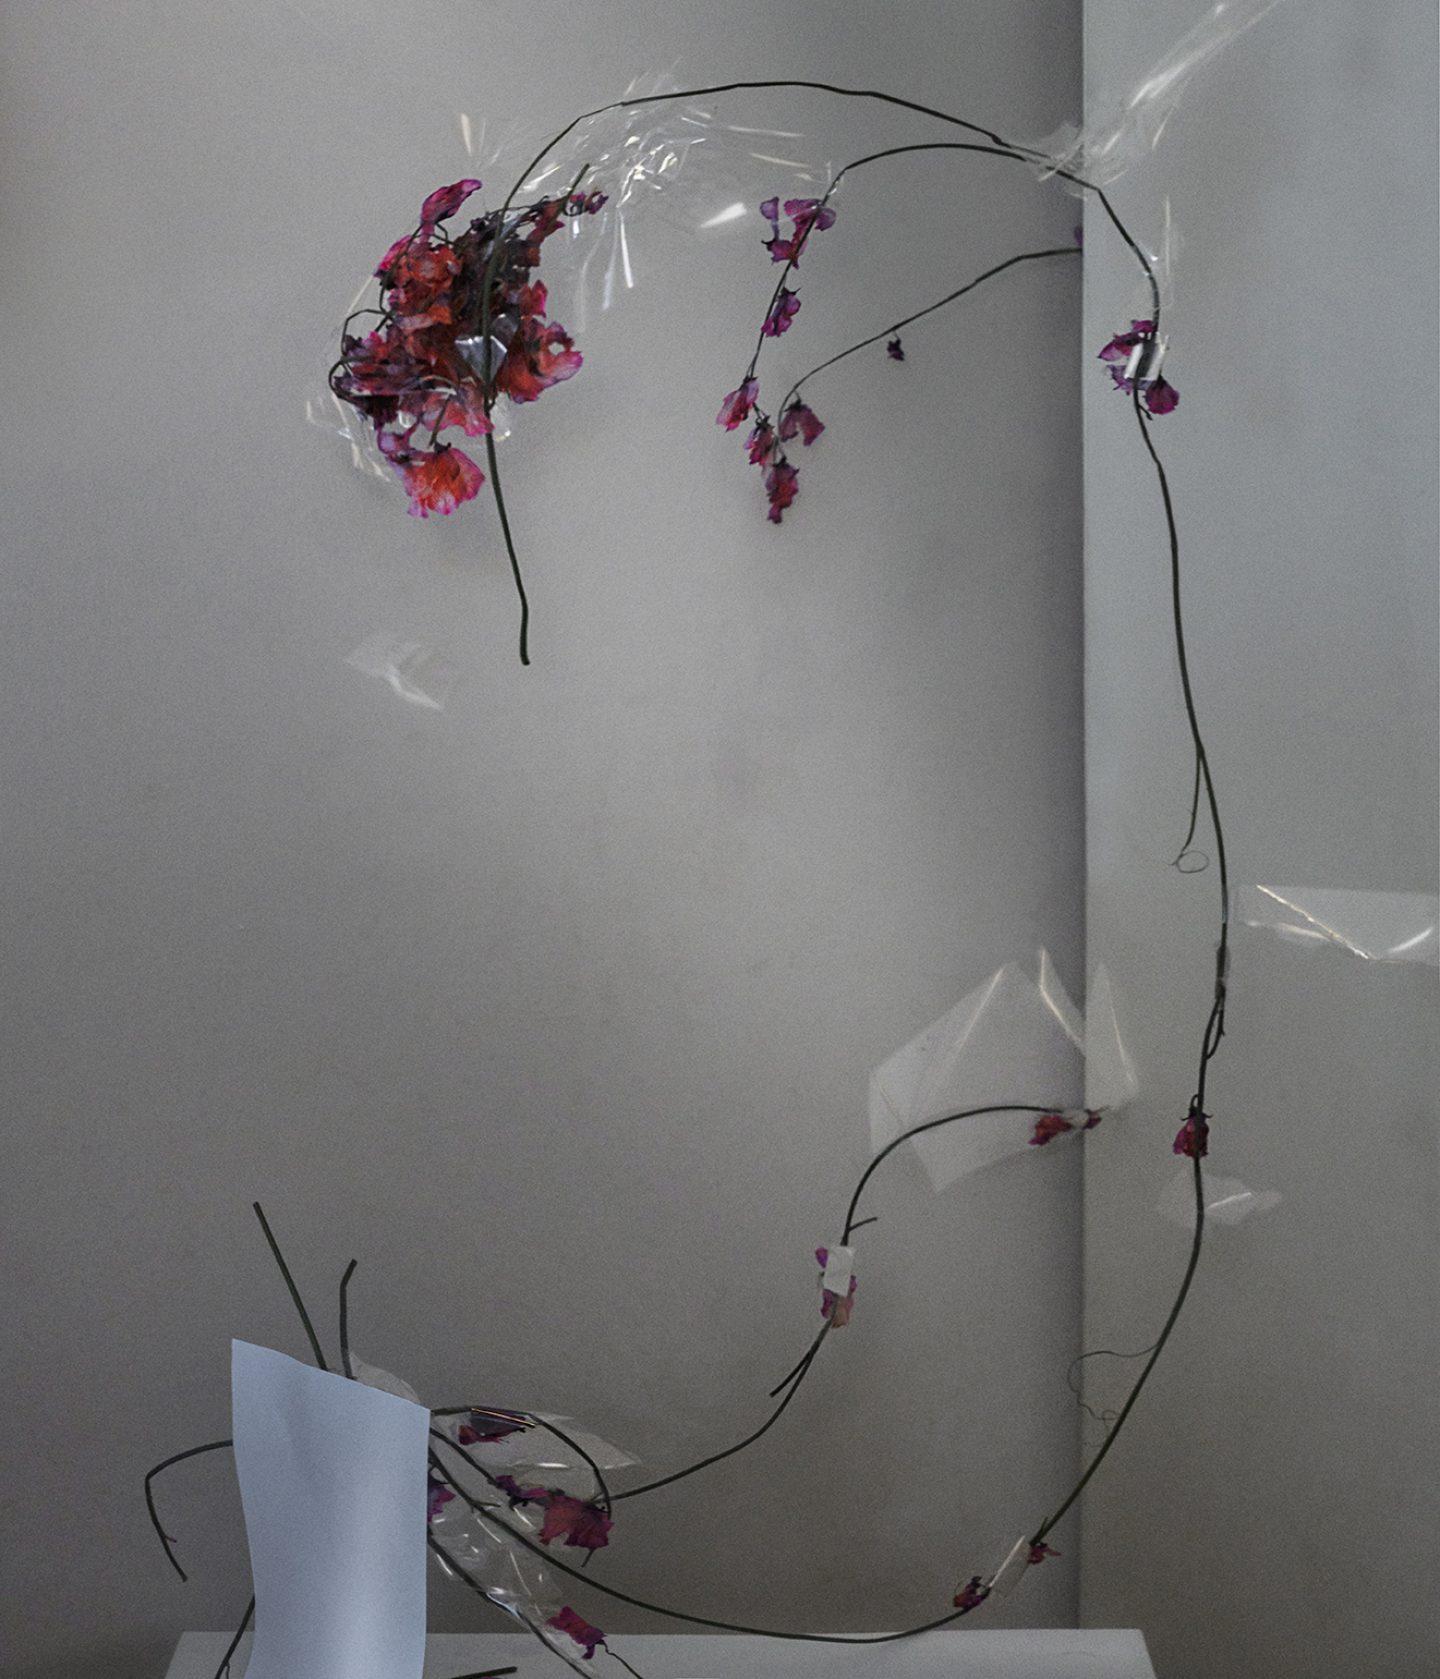 IGNANT-Photograpy-Donimik-Tarabanski-Roses-New-06